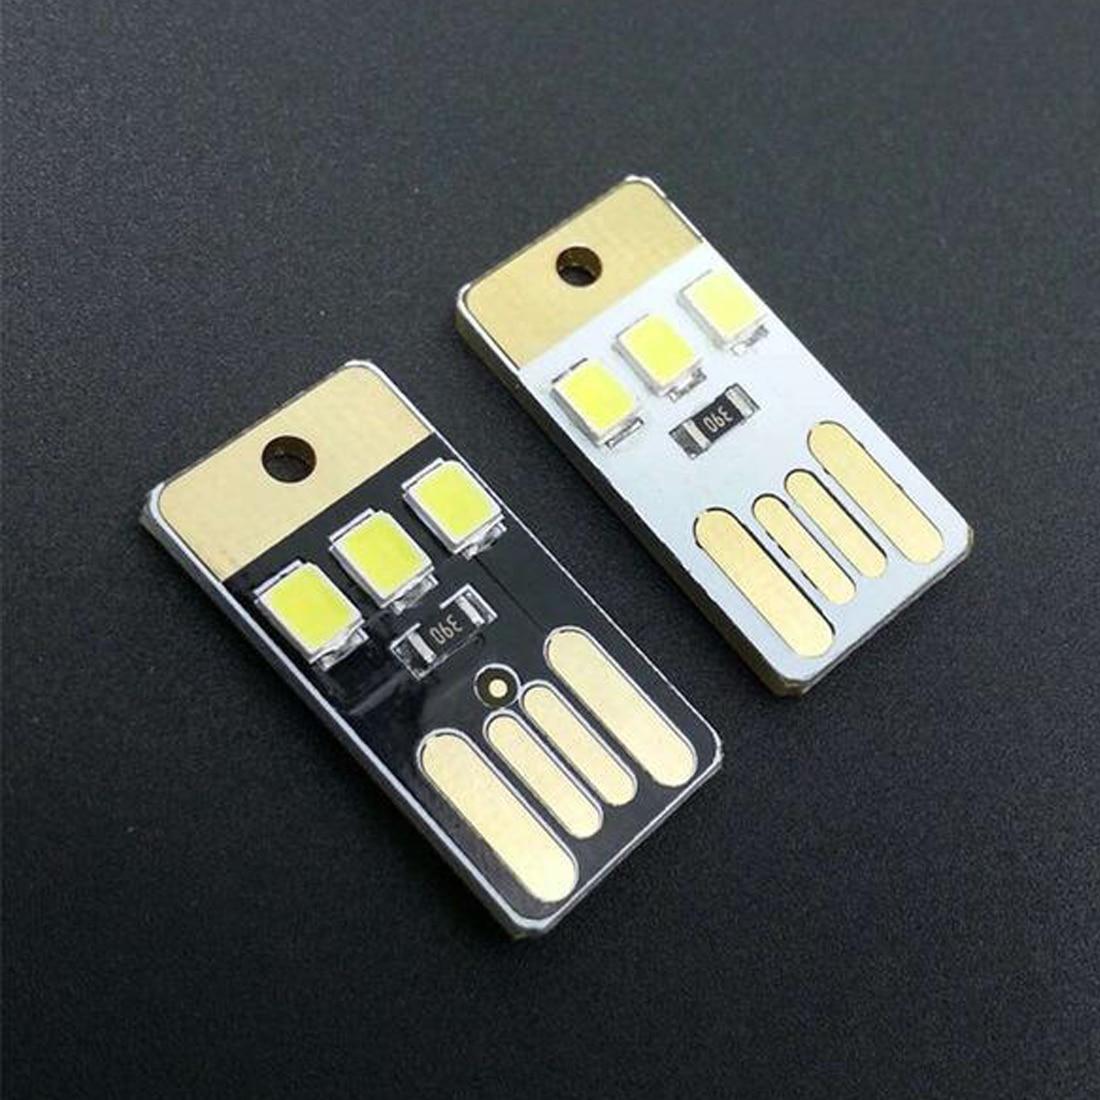 Mini LED Night Light Pocket Card Lamp Led Keychain Lamp Portable USB Power